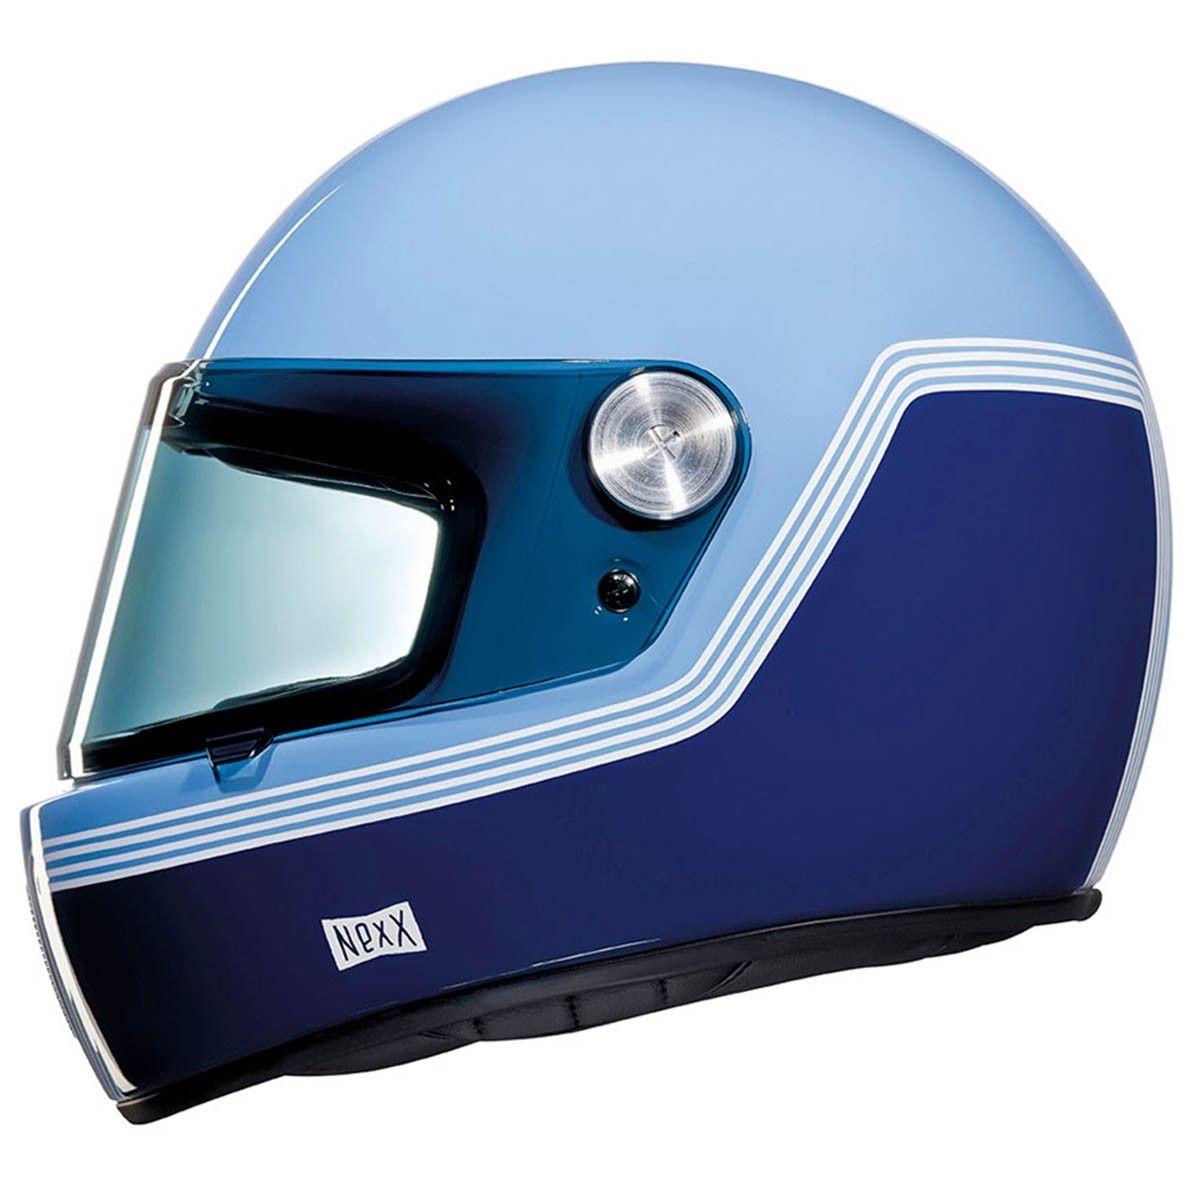 d76eee73 Nexx XG100R Grandwin Helmet - Black / Blue / White | Helmets | Full face  motorcycle helmets, Black motorcycle helmet, Motorcycle helmets